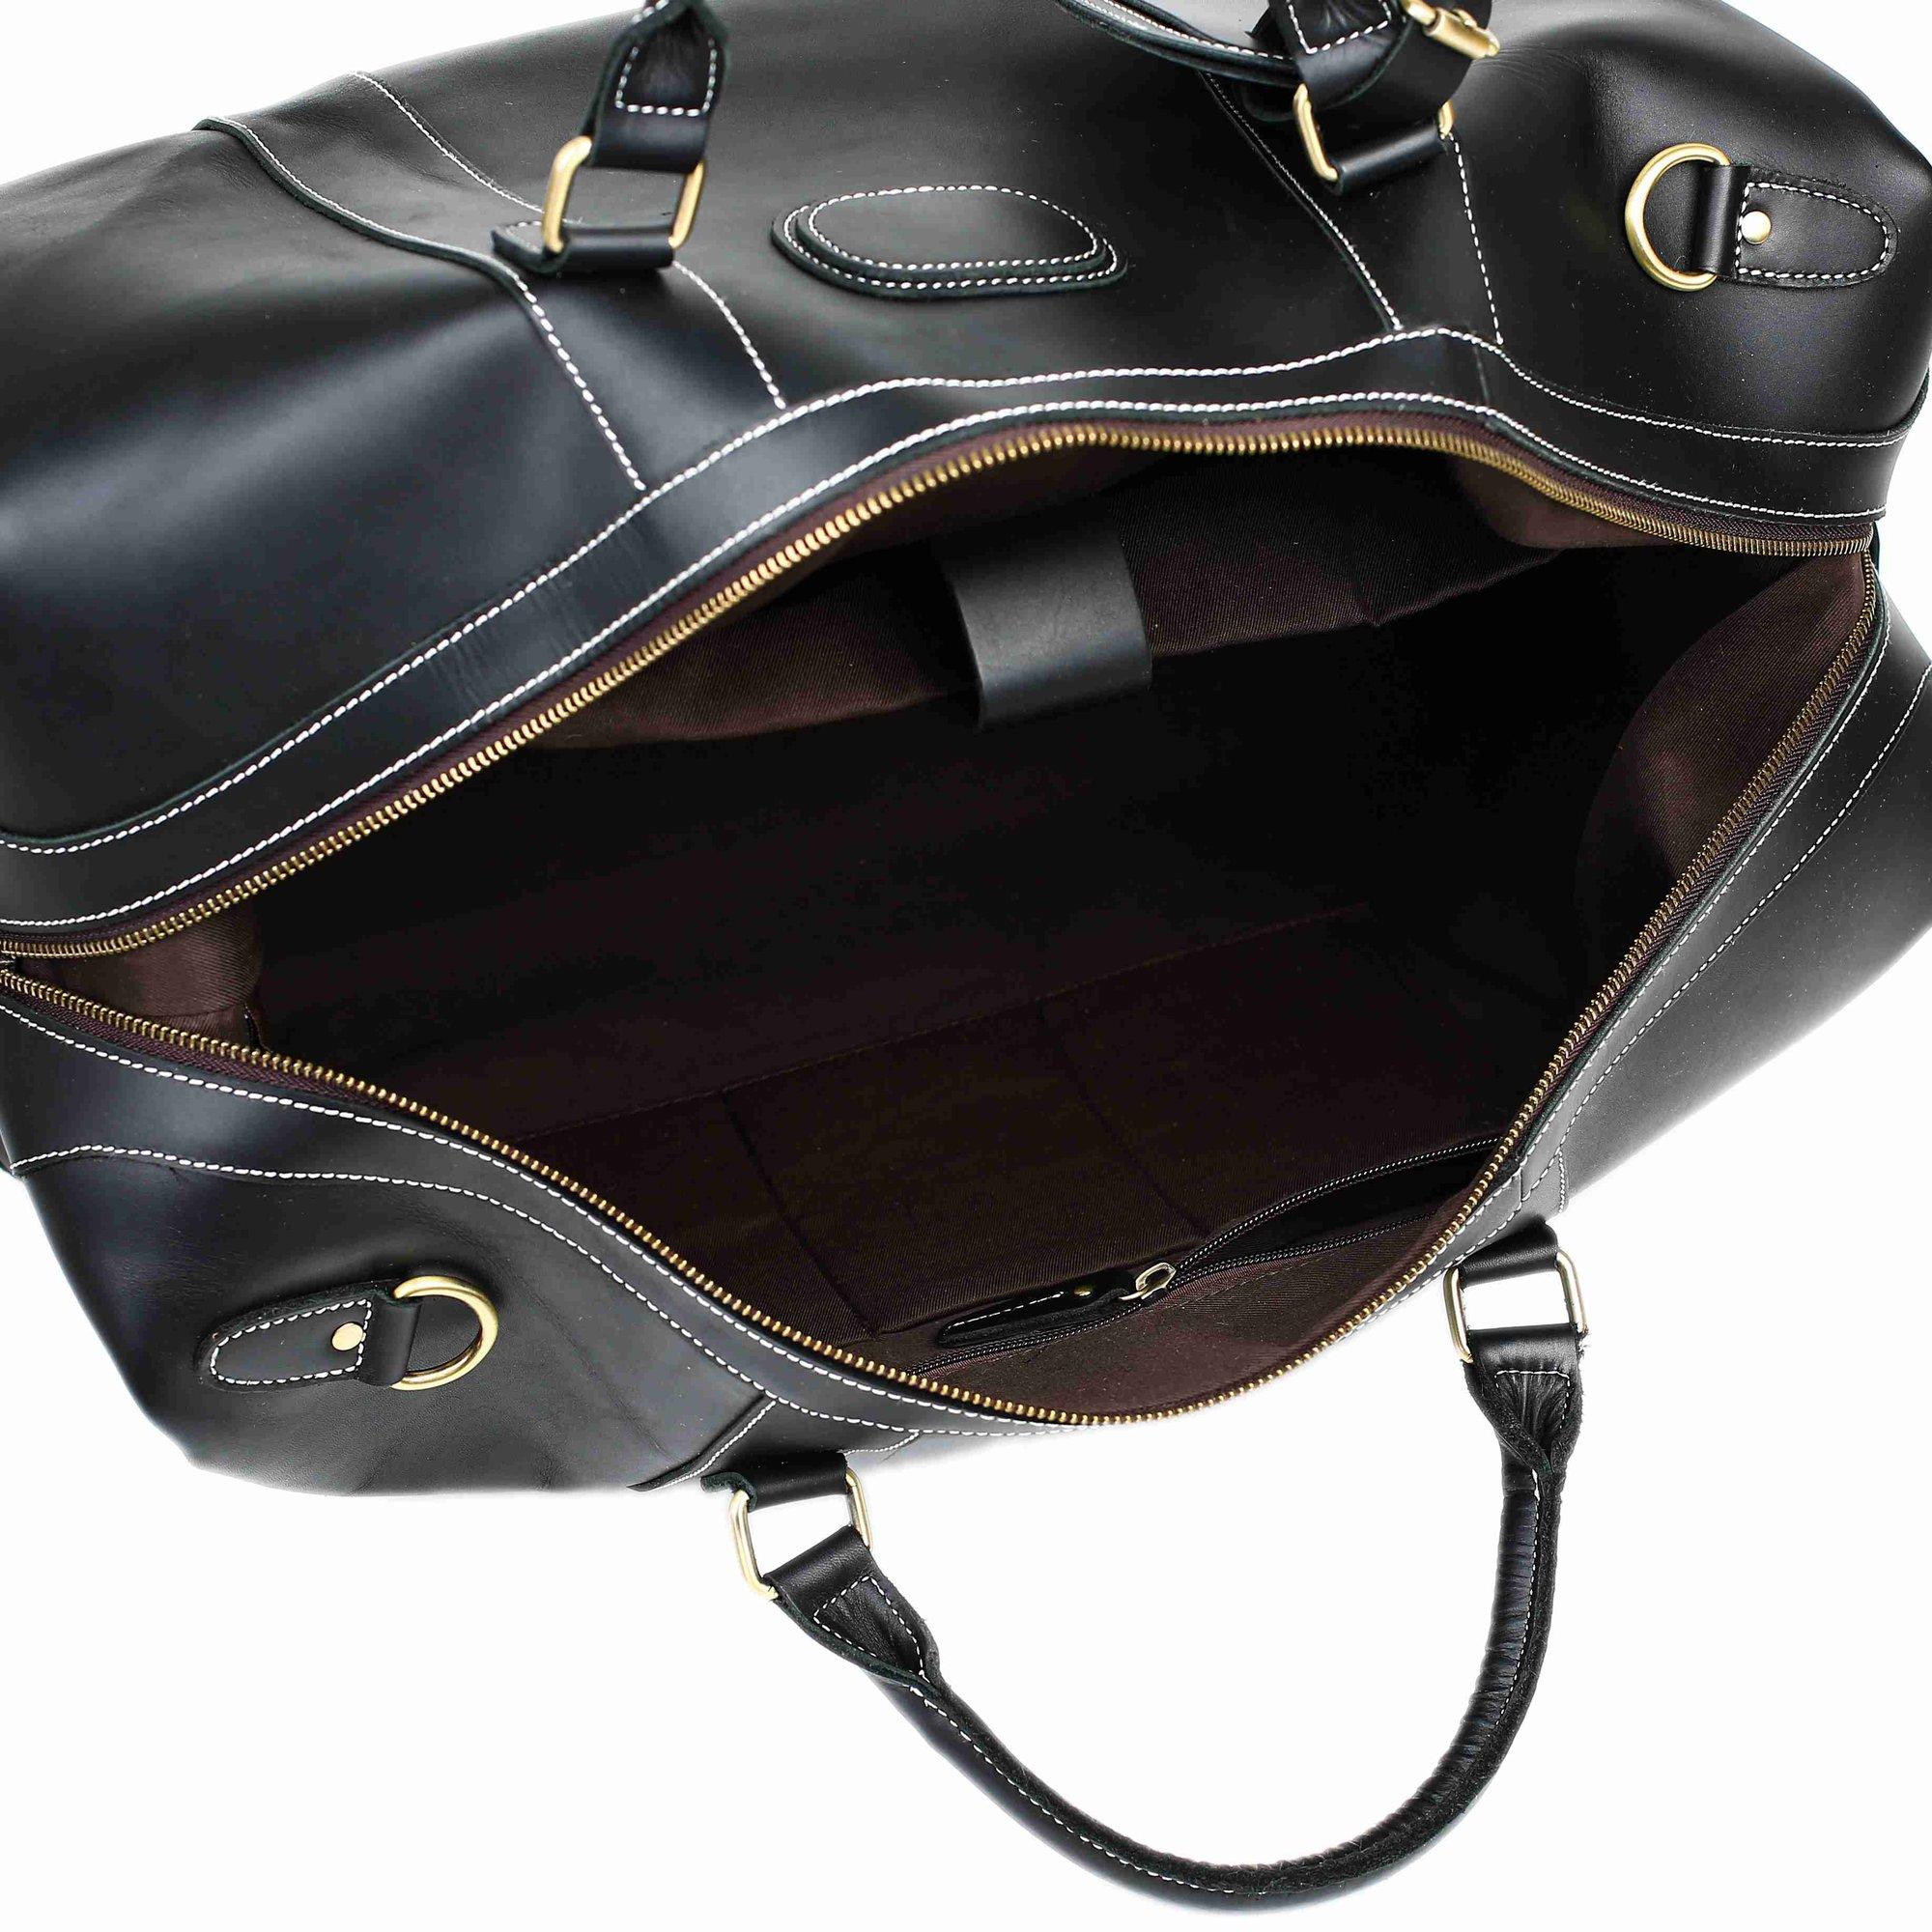 Handmade Full Grain Leather Duffle Bag, Large Travel Bag, Mens Weekender Bag  DZ07 2570070826